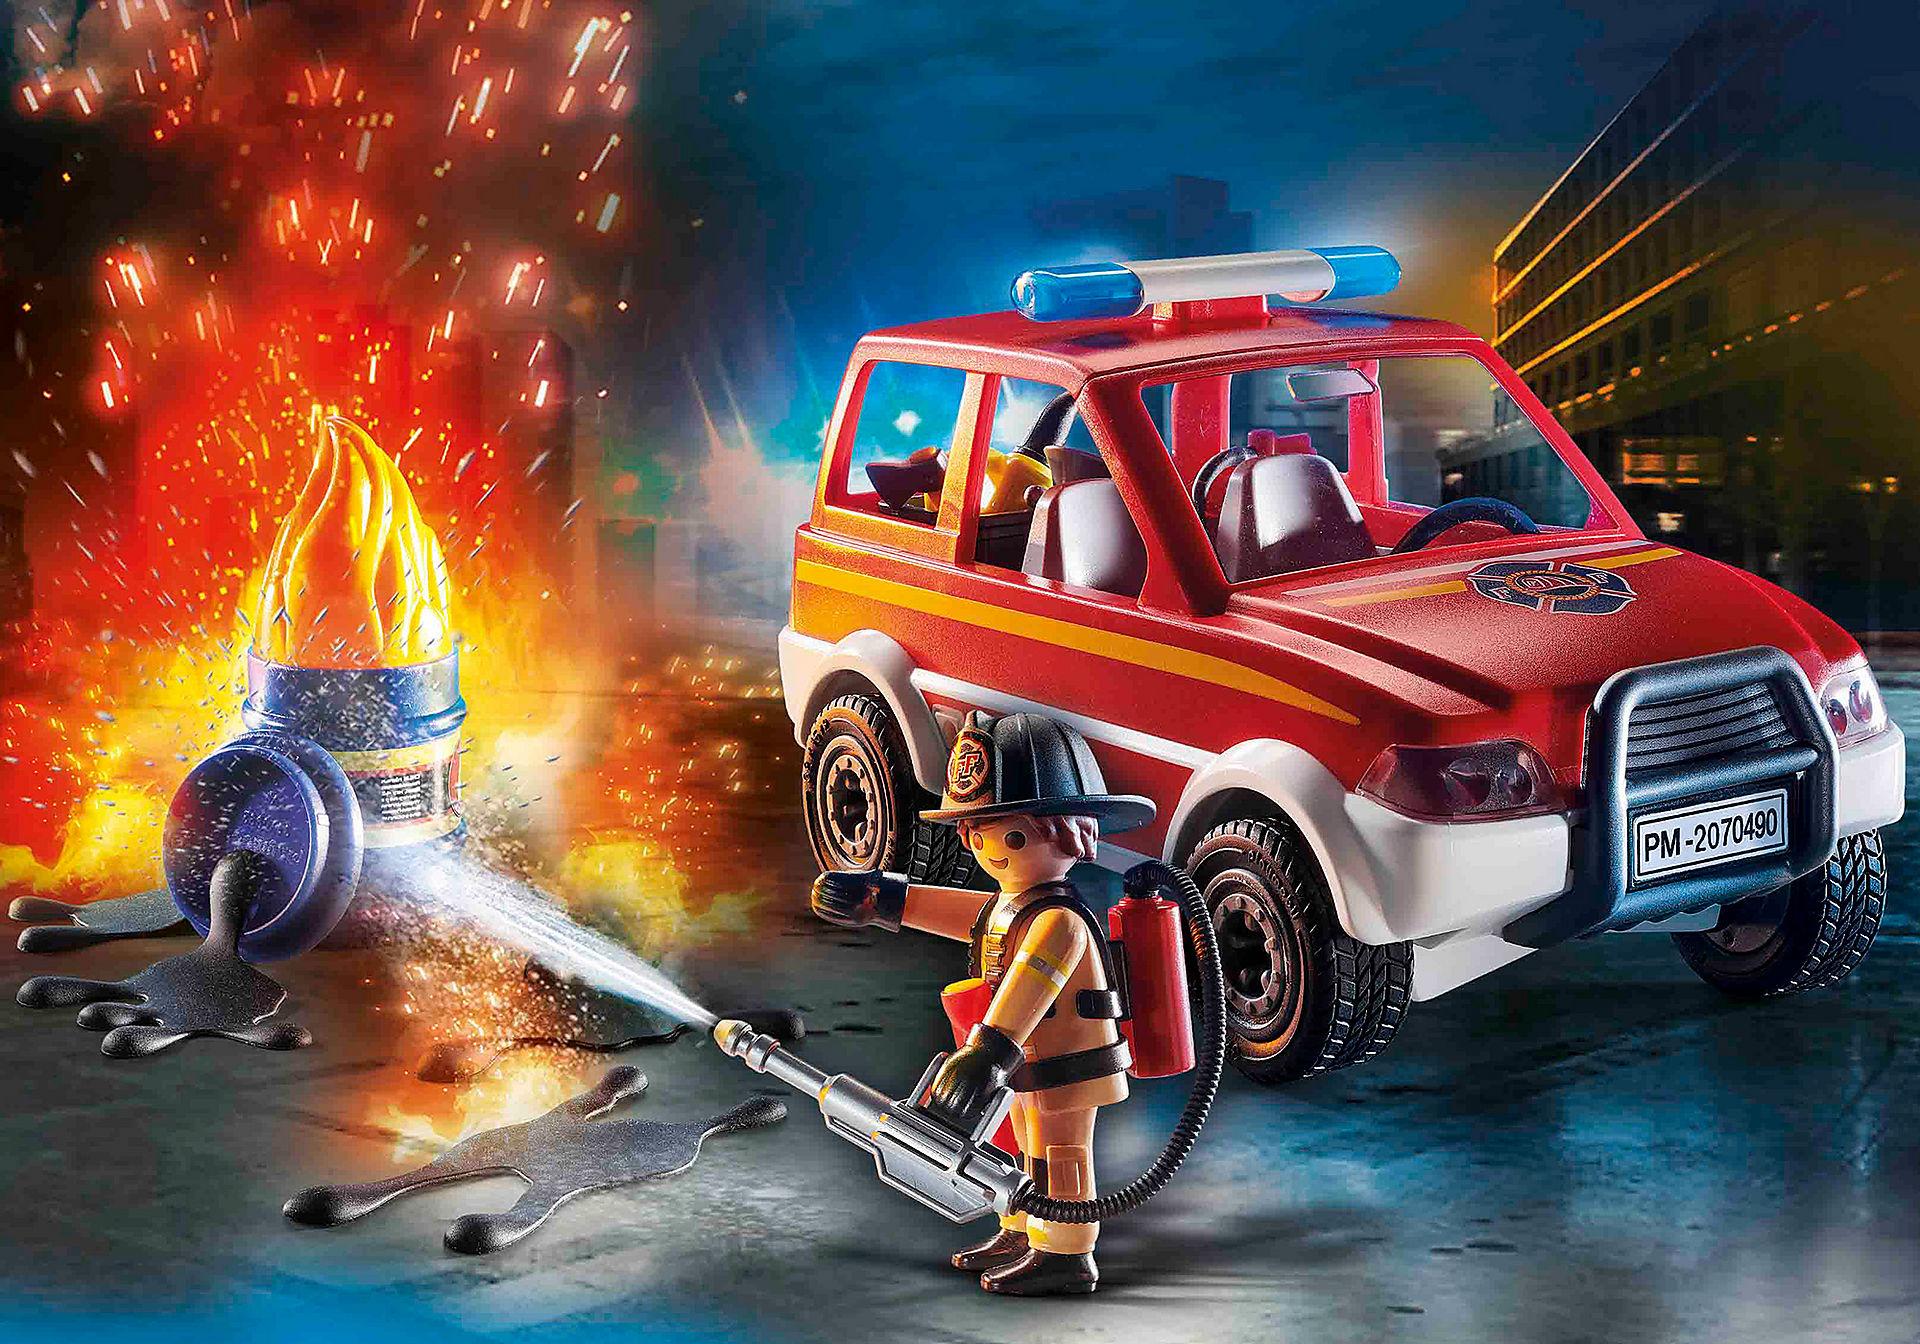 70490 City Fire Emergency zoom image1